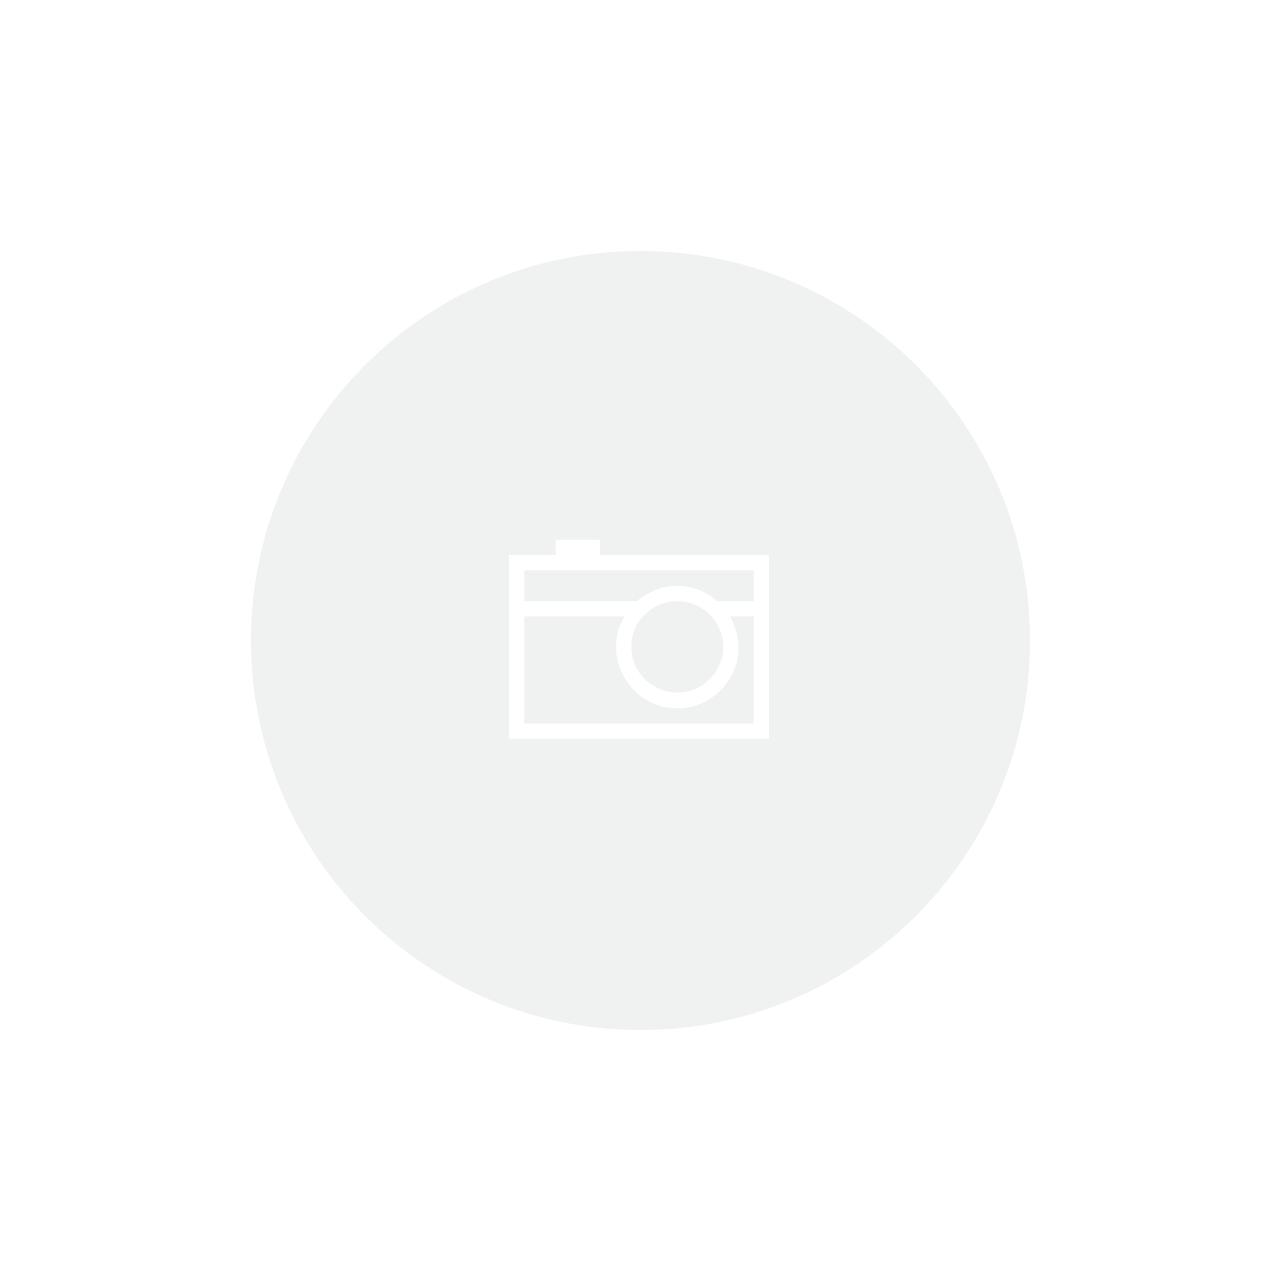 Cj 6 Letreiros de Porcelana p/ Queijo c/ Caneta Marcador